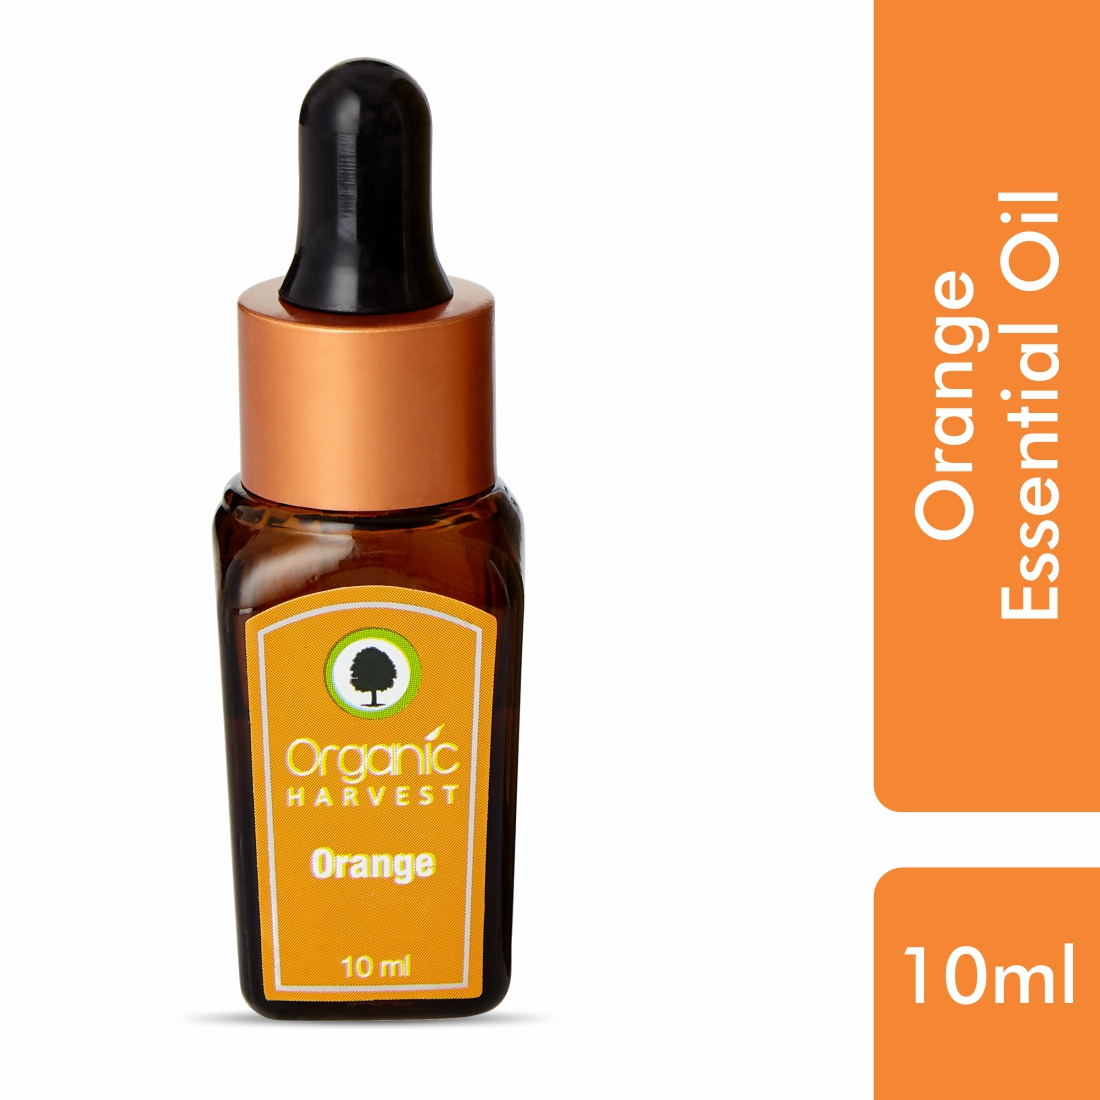 Organic Harvest | Orange Oil - 10ml